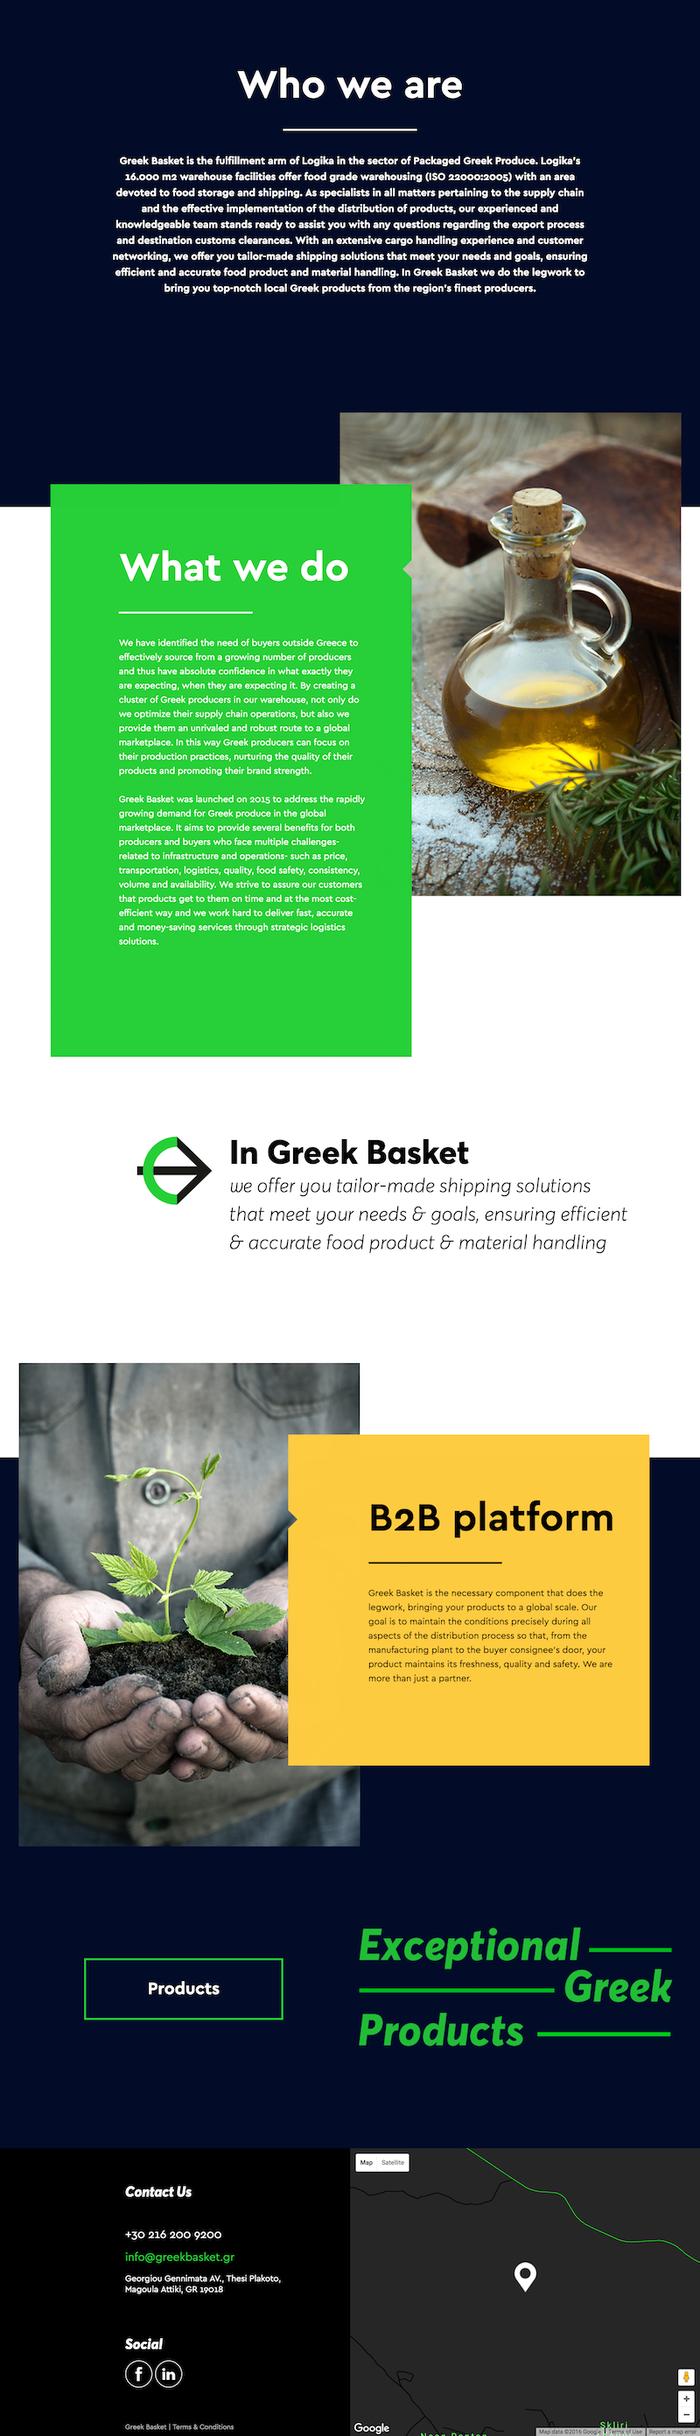 The Greek Basket 2